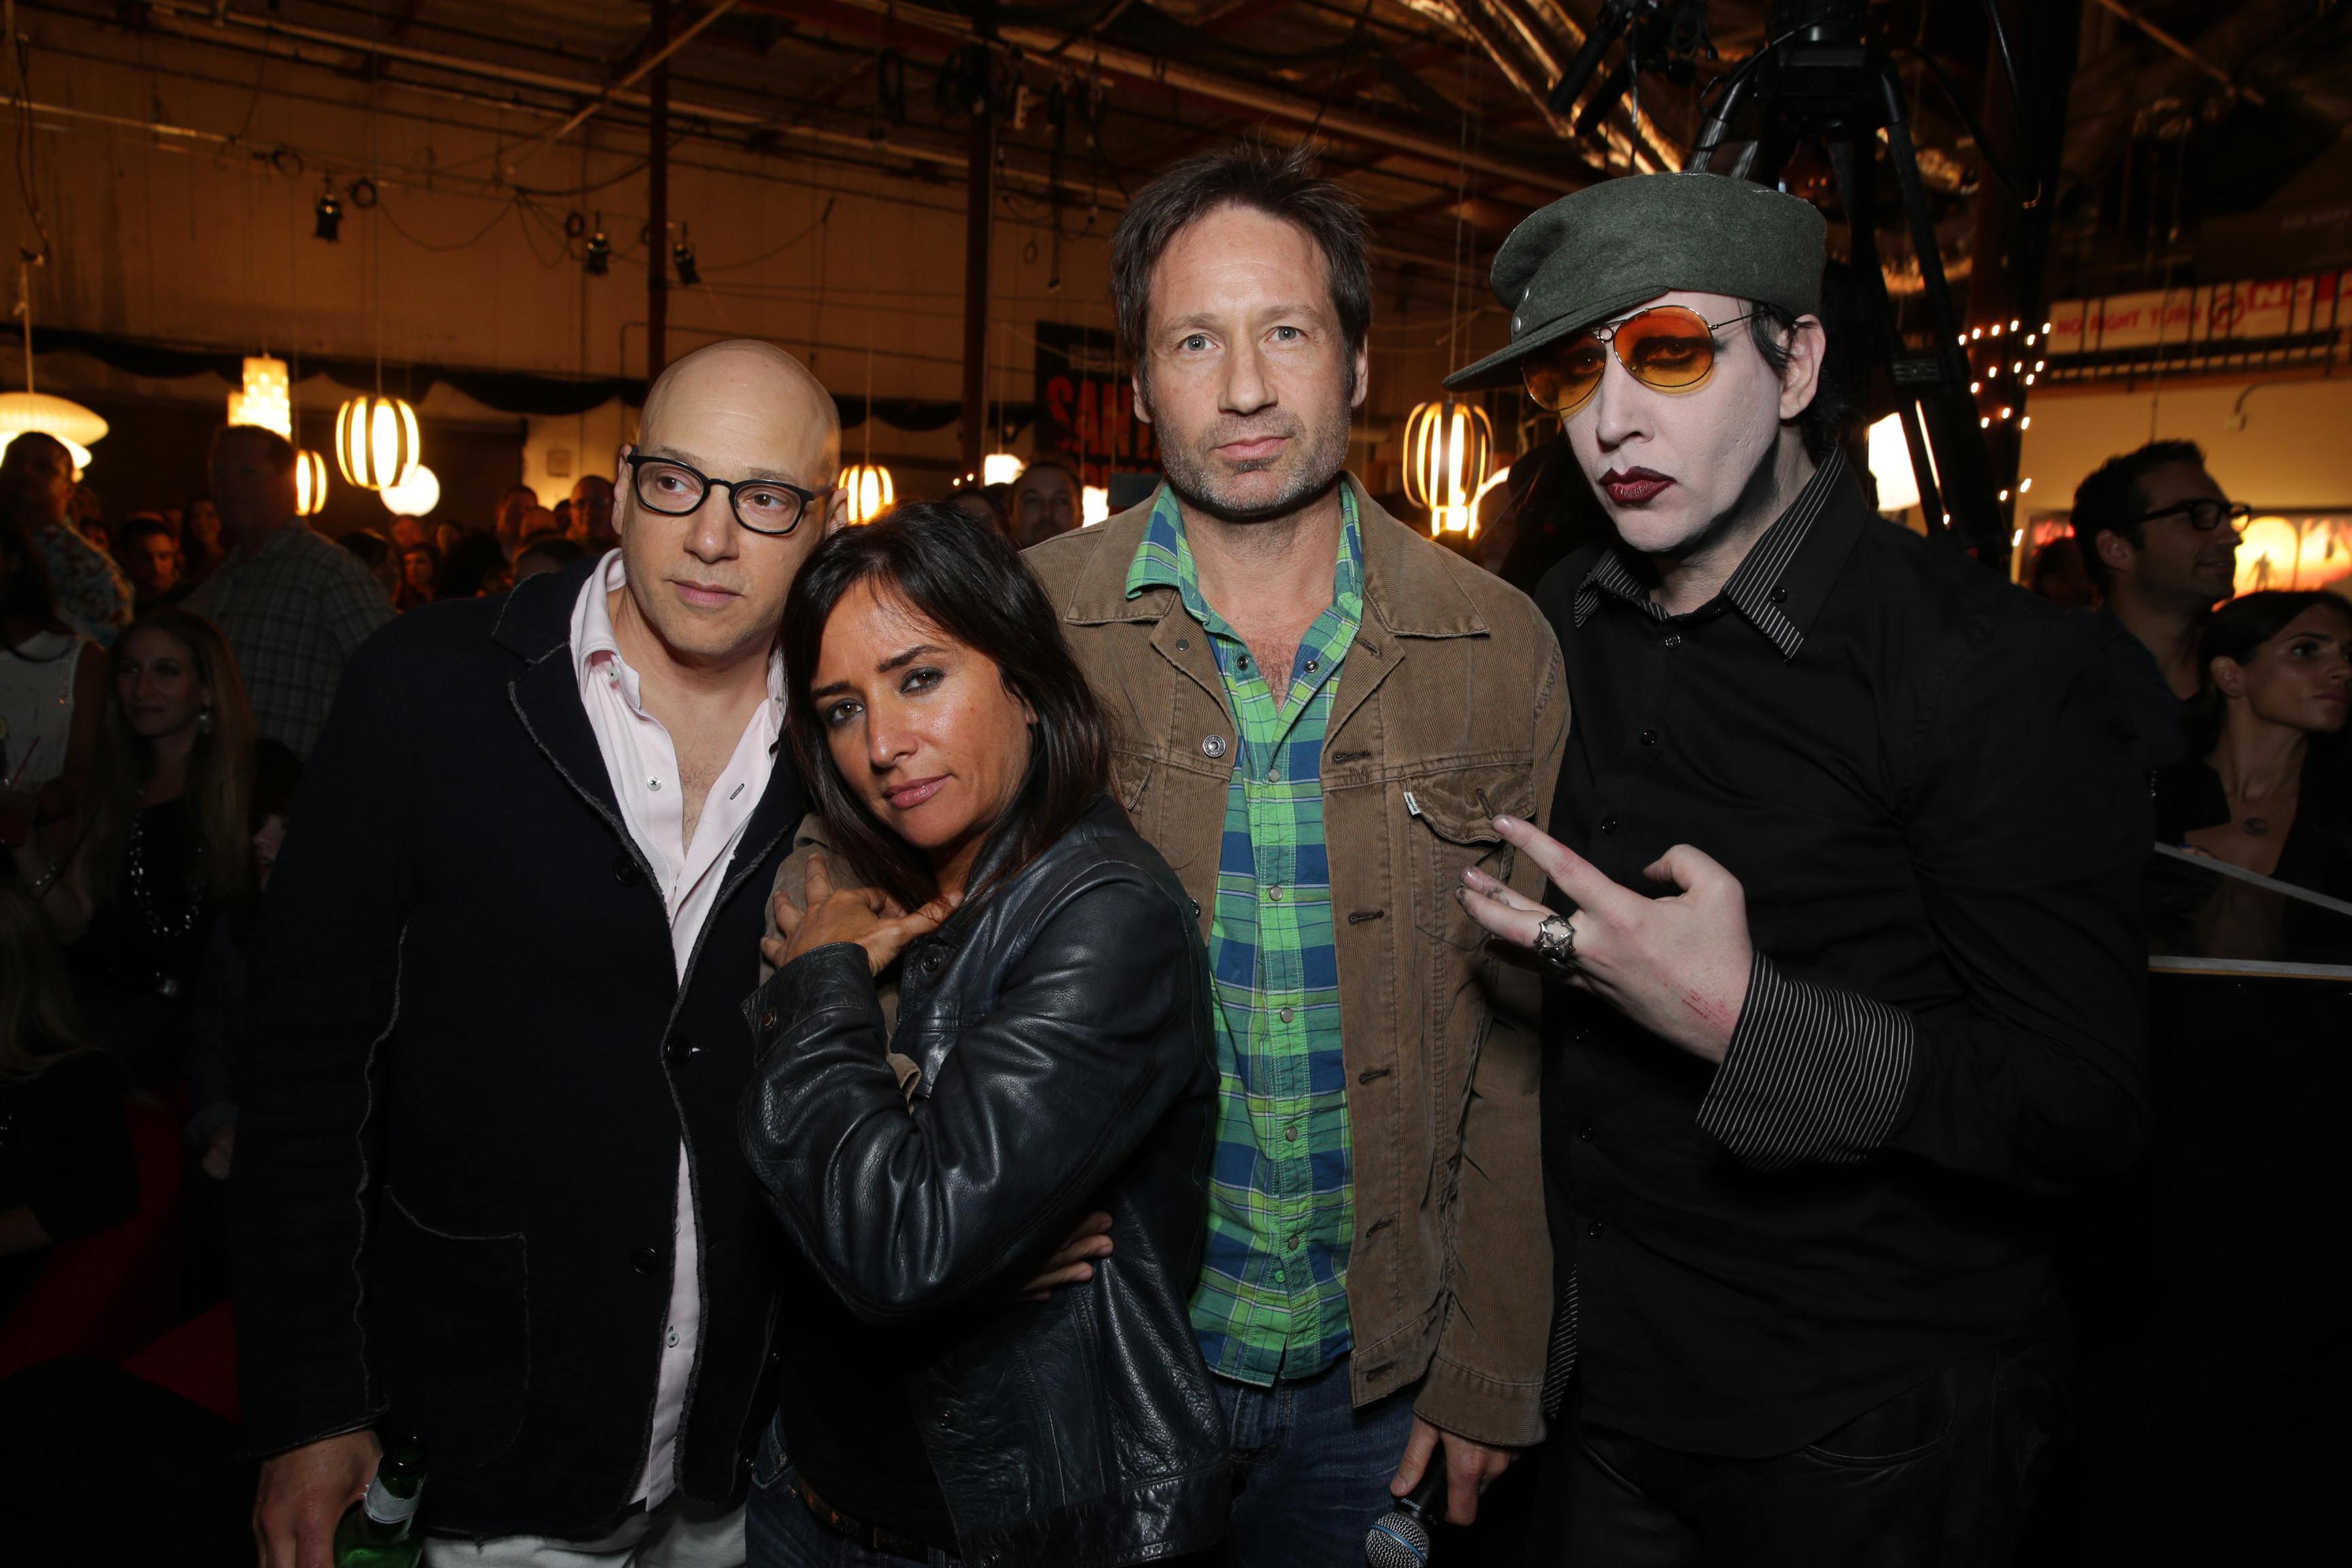 Californication - Season 7 - Wrap Party Photos (21)_FULL.jpg